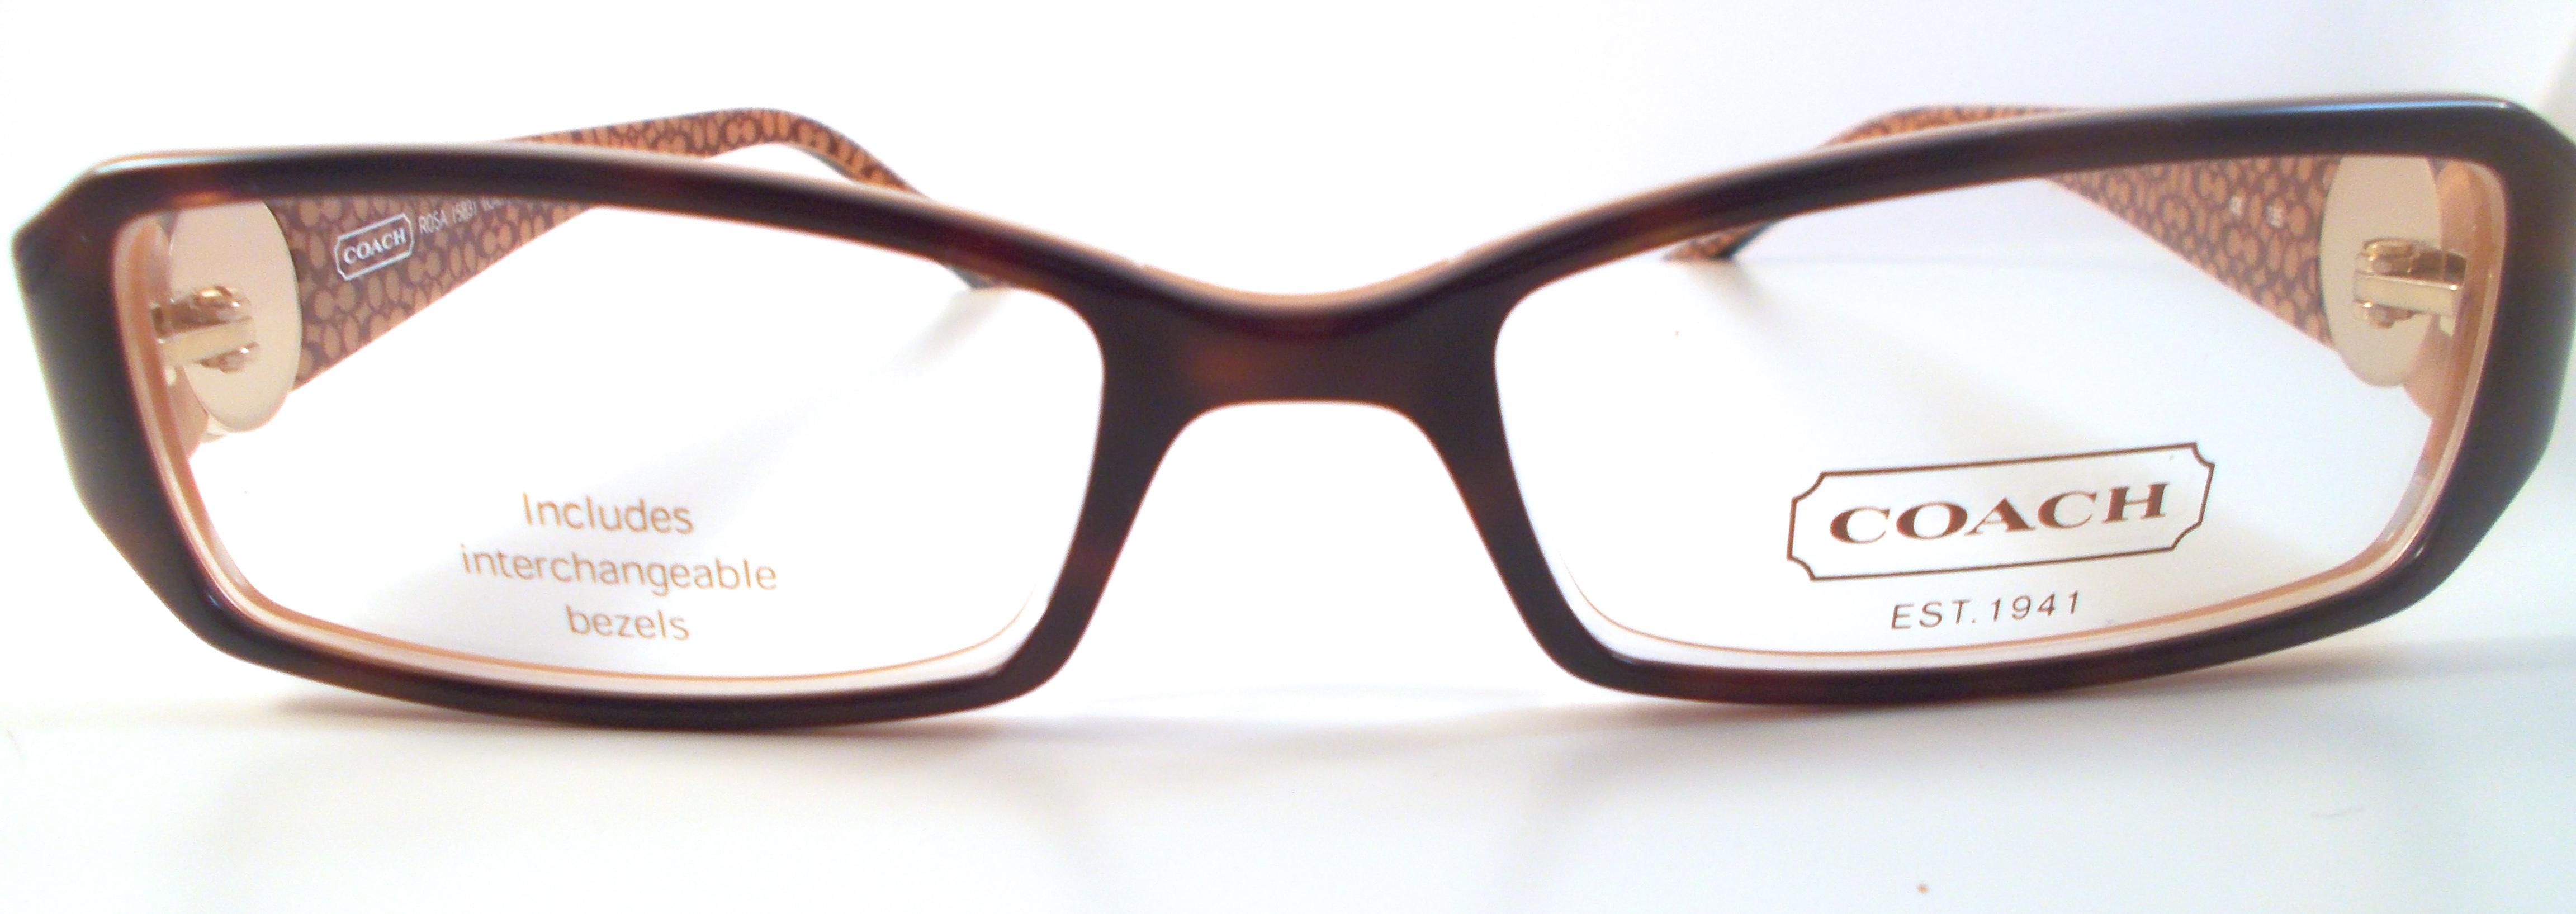 H&S Optical Coach Eyewear Rosa (583) Online Store ...